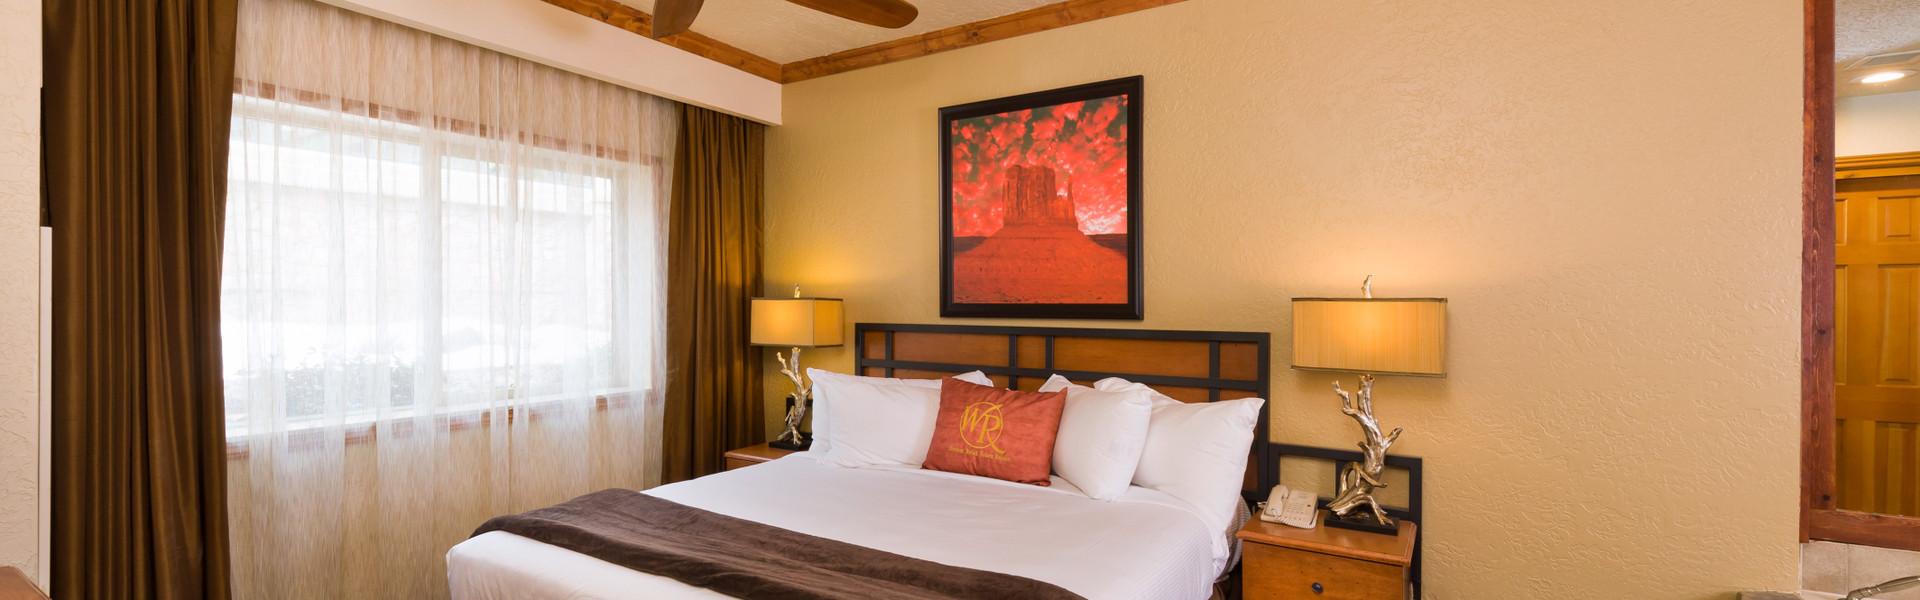 Signature Four Bedroom Loft Accommodations at a Utah Mountain Ski Resort | Westgate Park City Resort & Spa